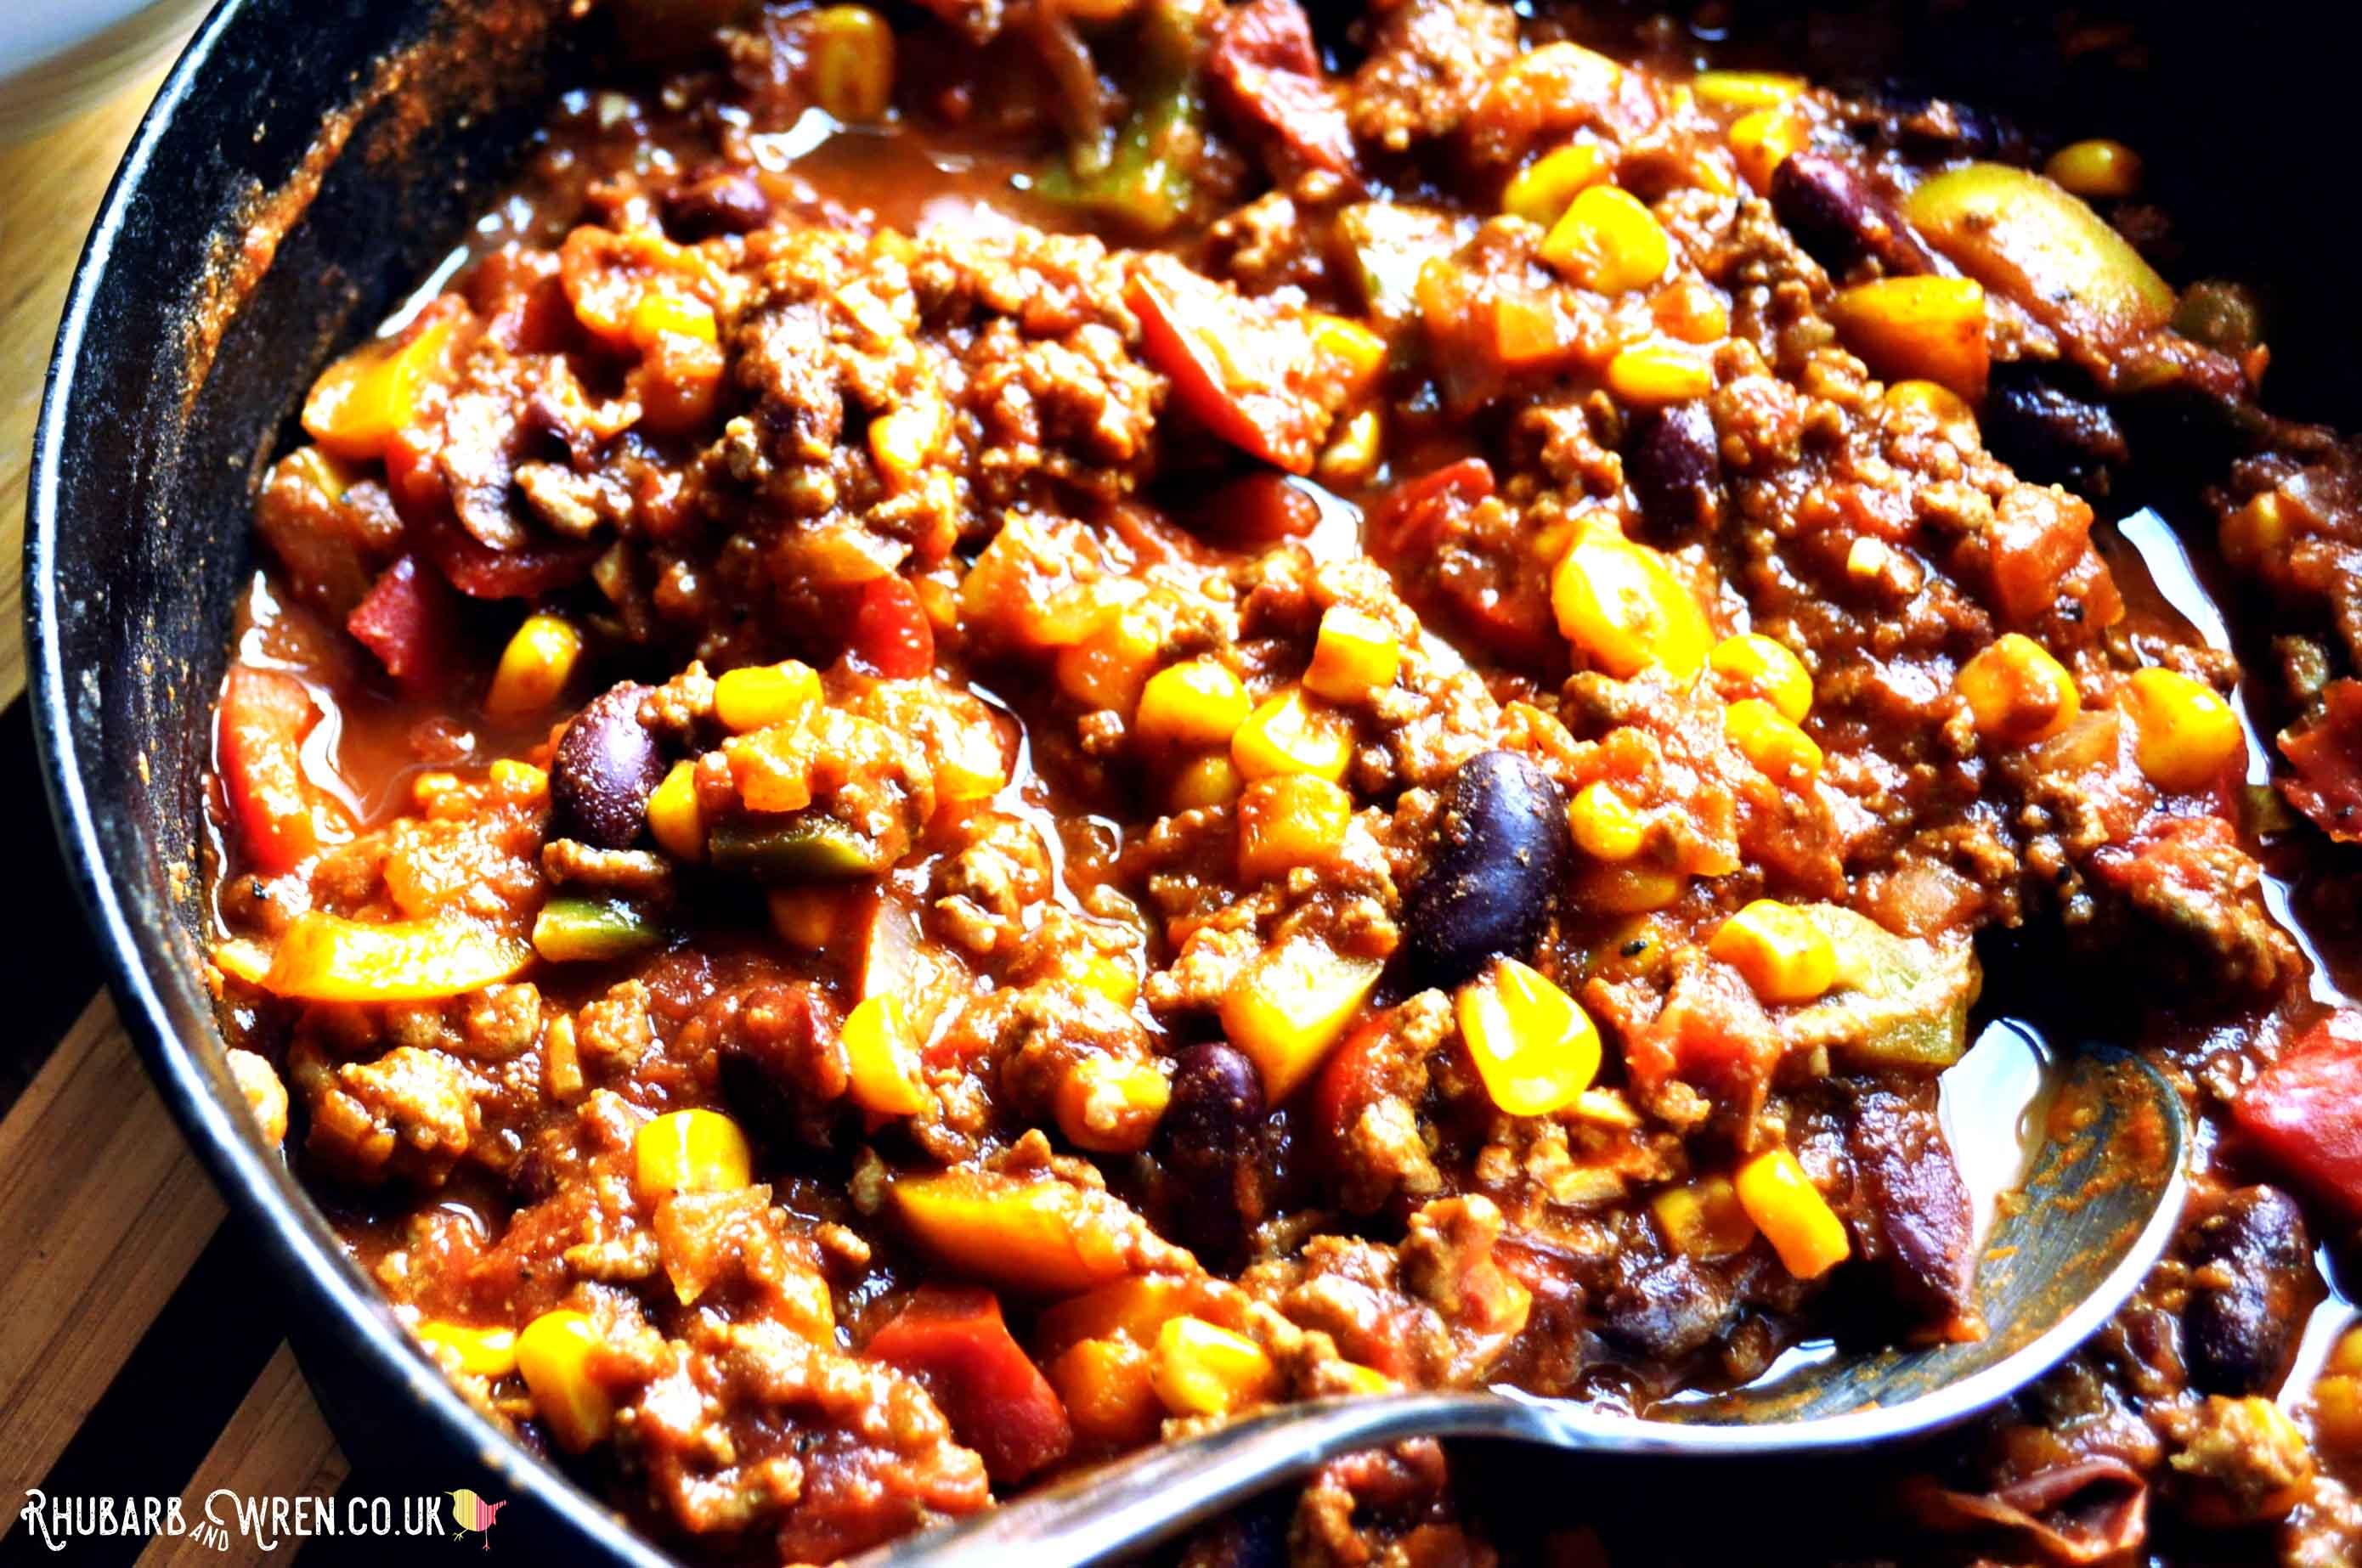 Family friendly vegan chilli recipe that kids love.